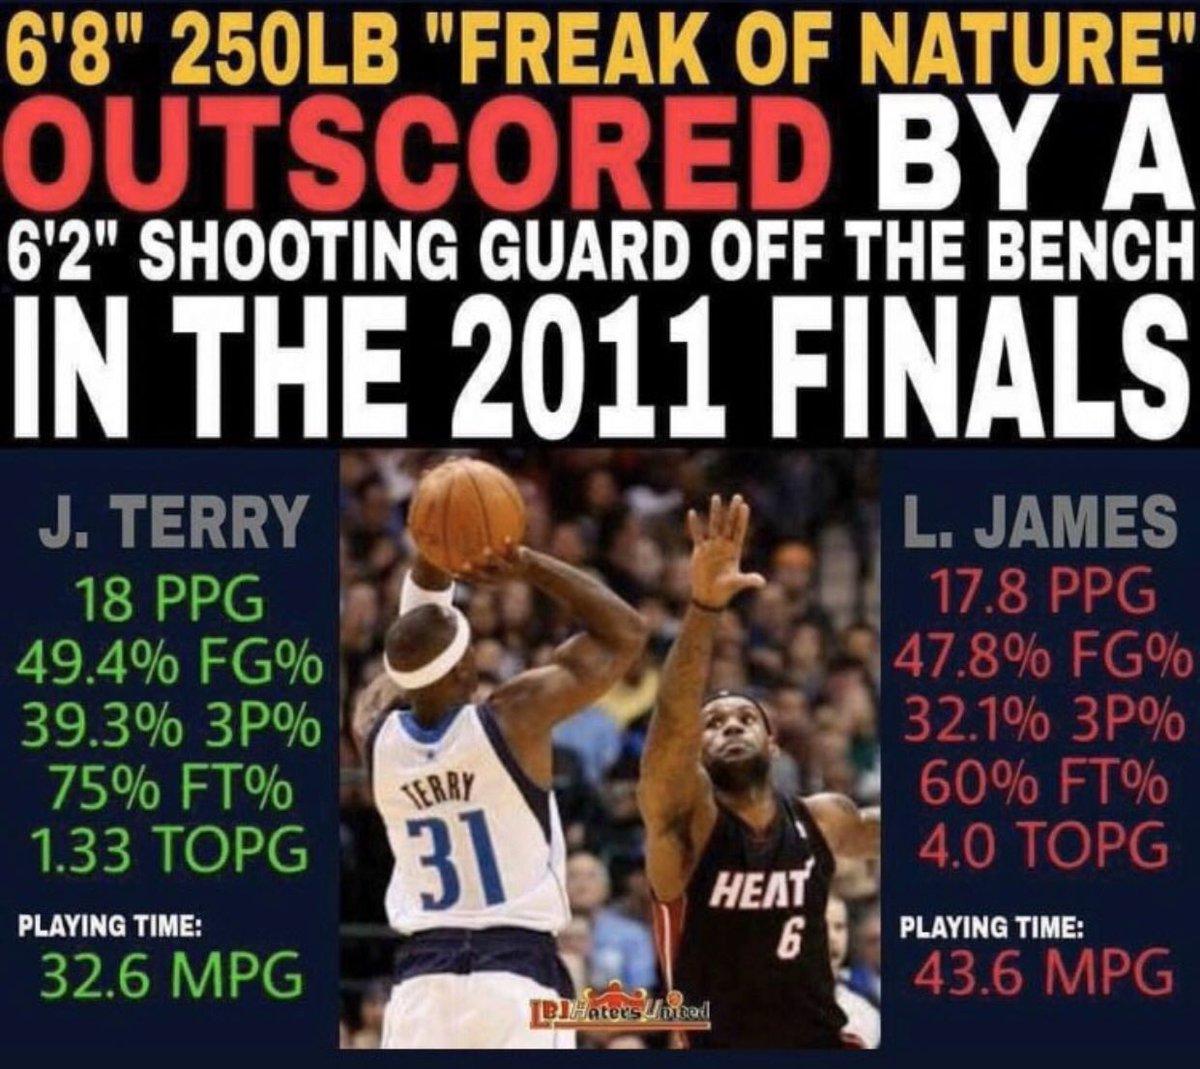 @NBA @swish41 @dallasmavs https://t.co/v8zWCZCrBx